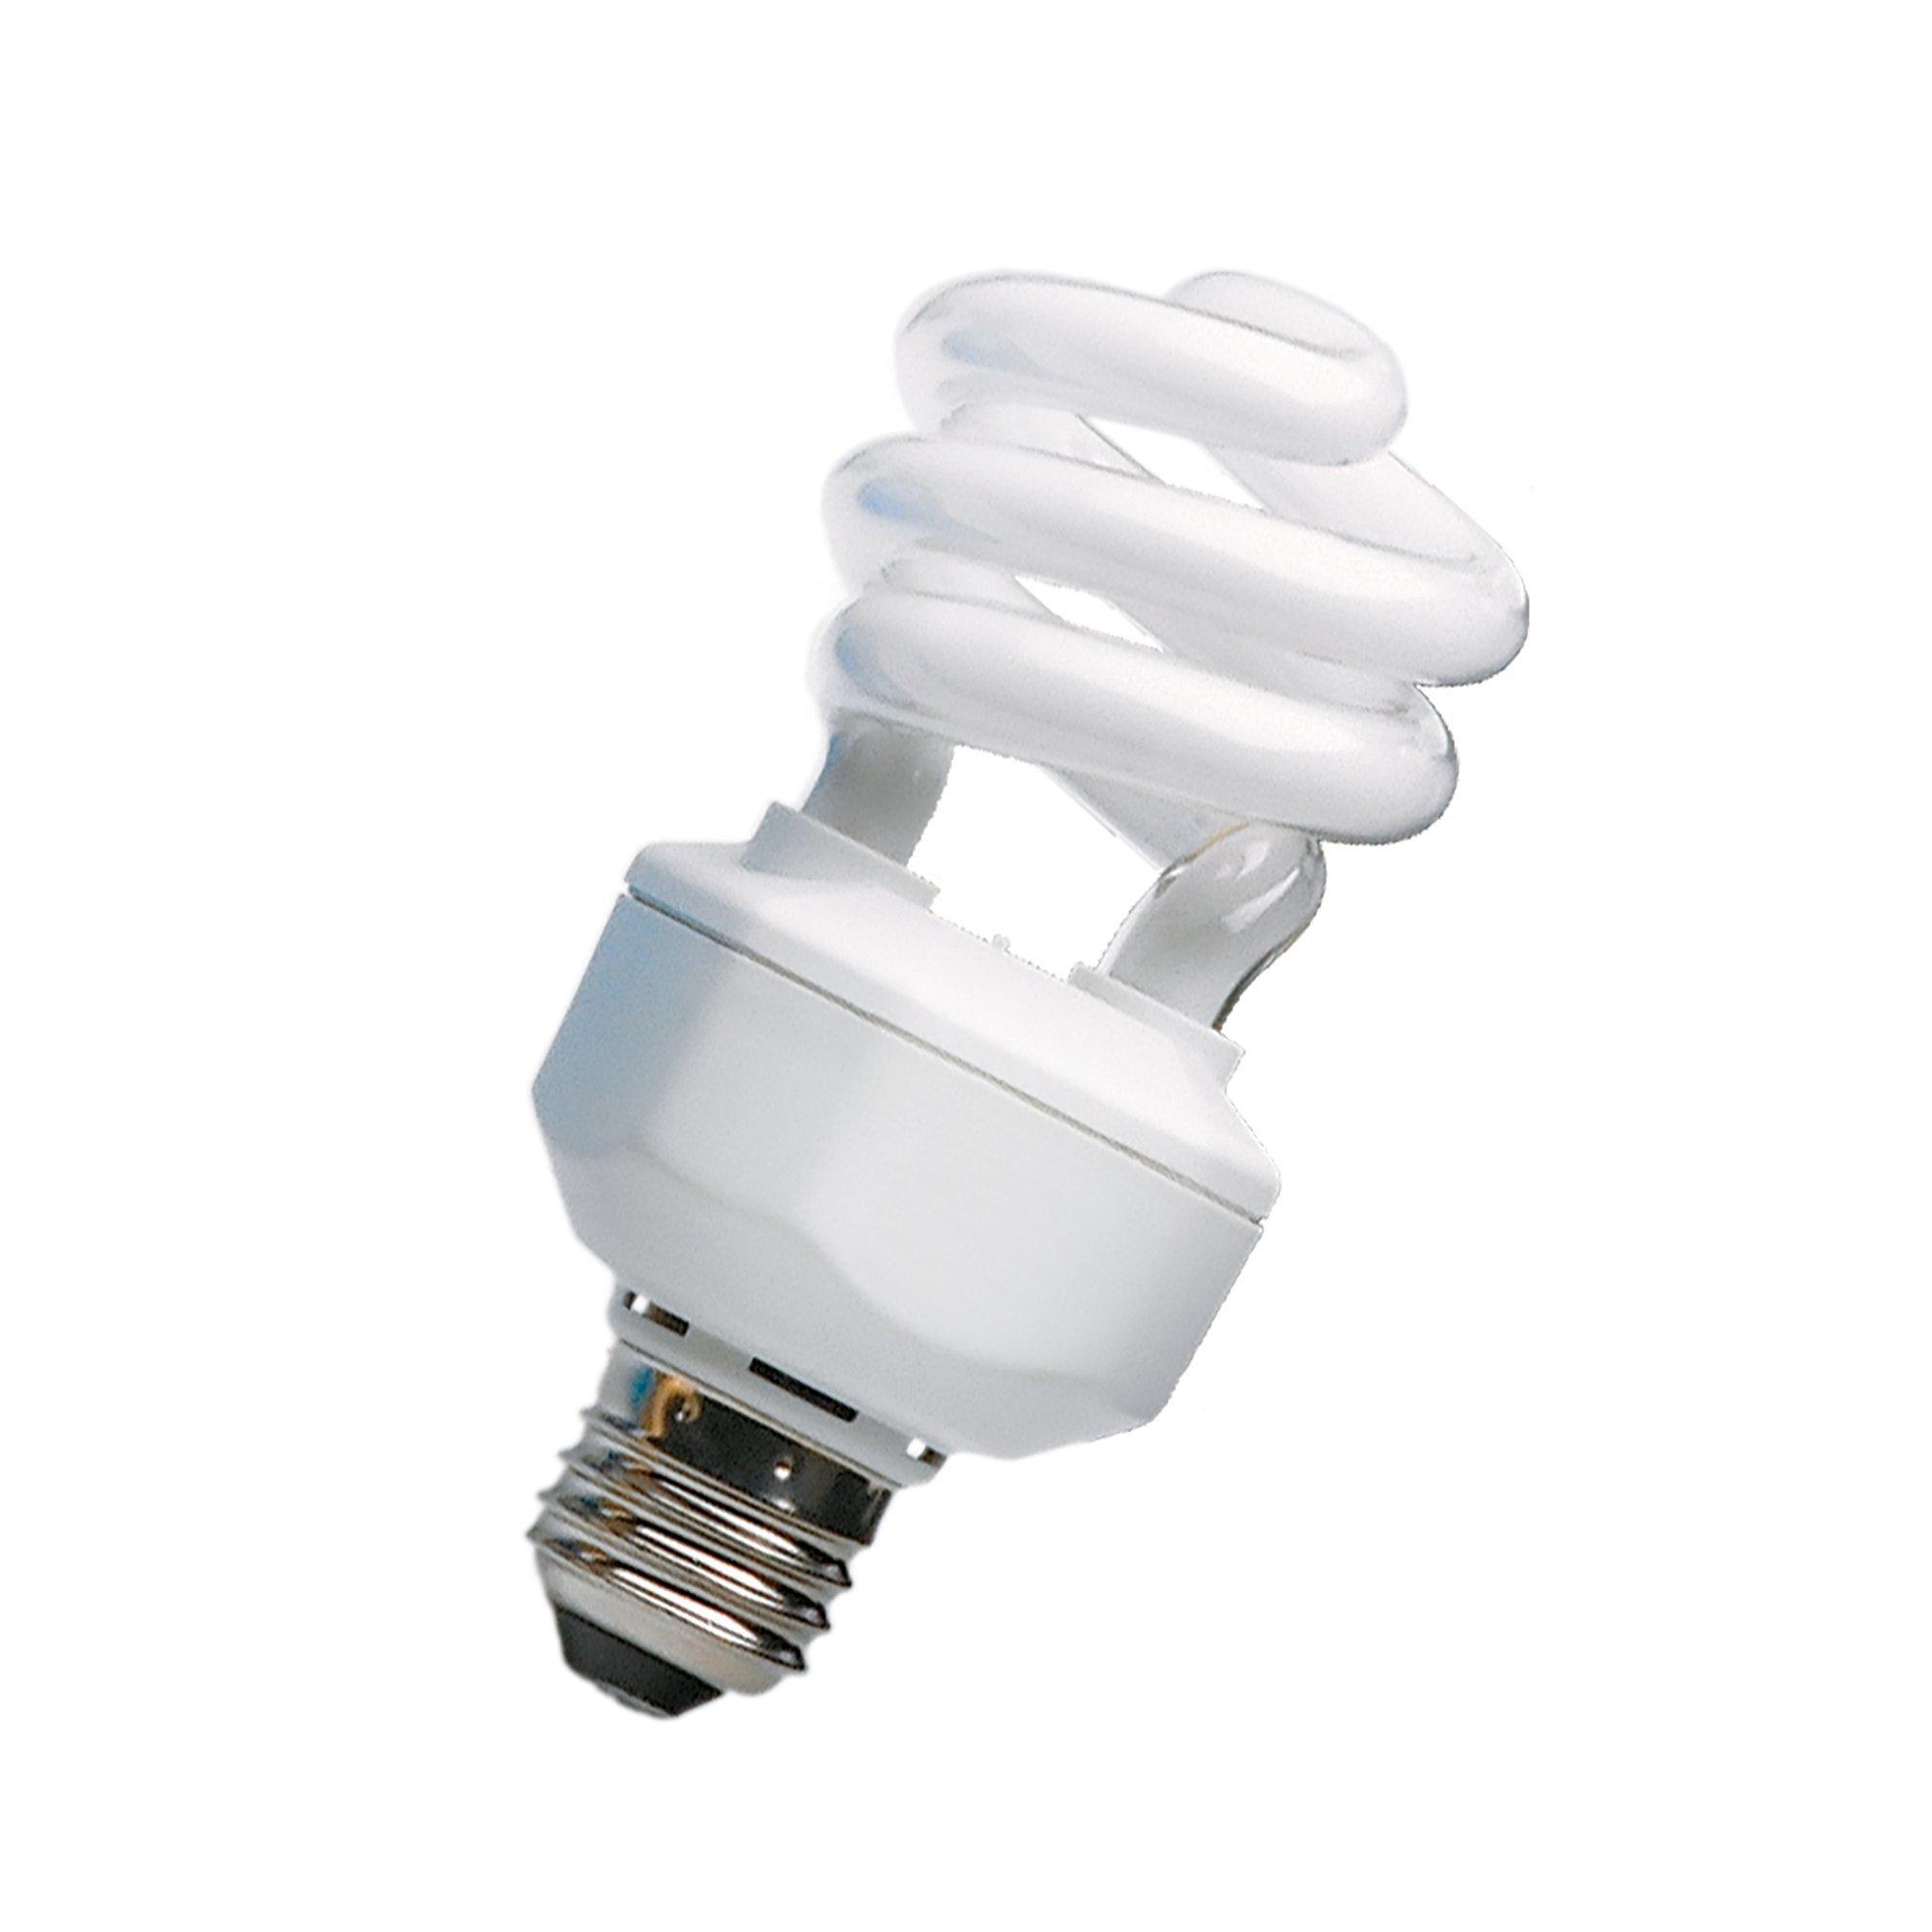 Zilla Desert Fluorescent UVB/UVA Bulb, 20 Watt, 3.875 IN by Zilla (Image #4)